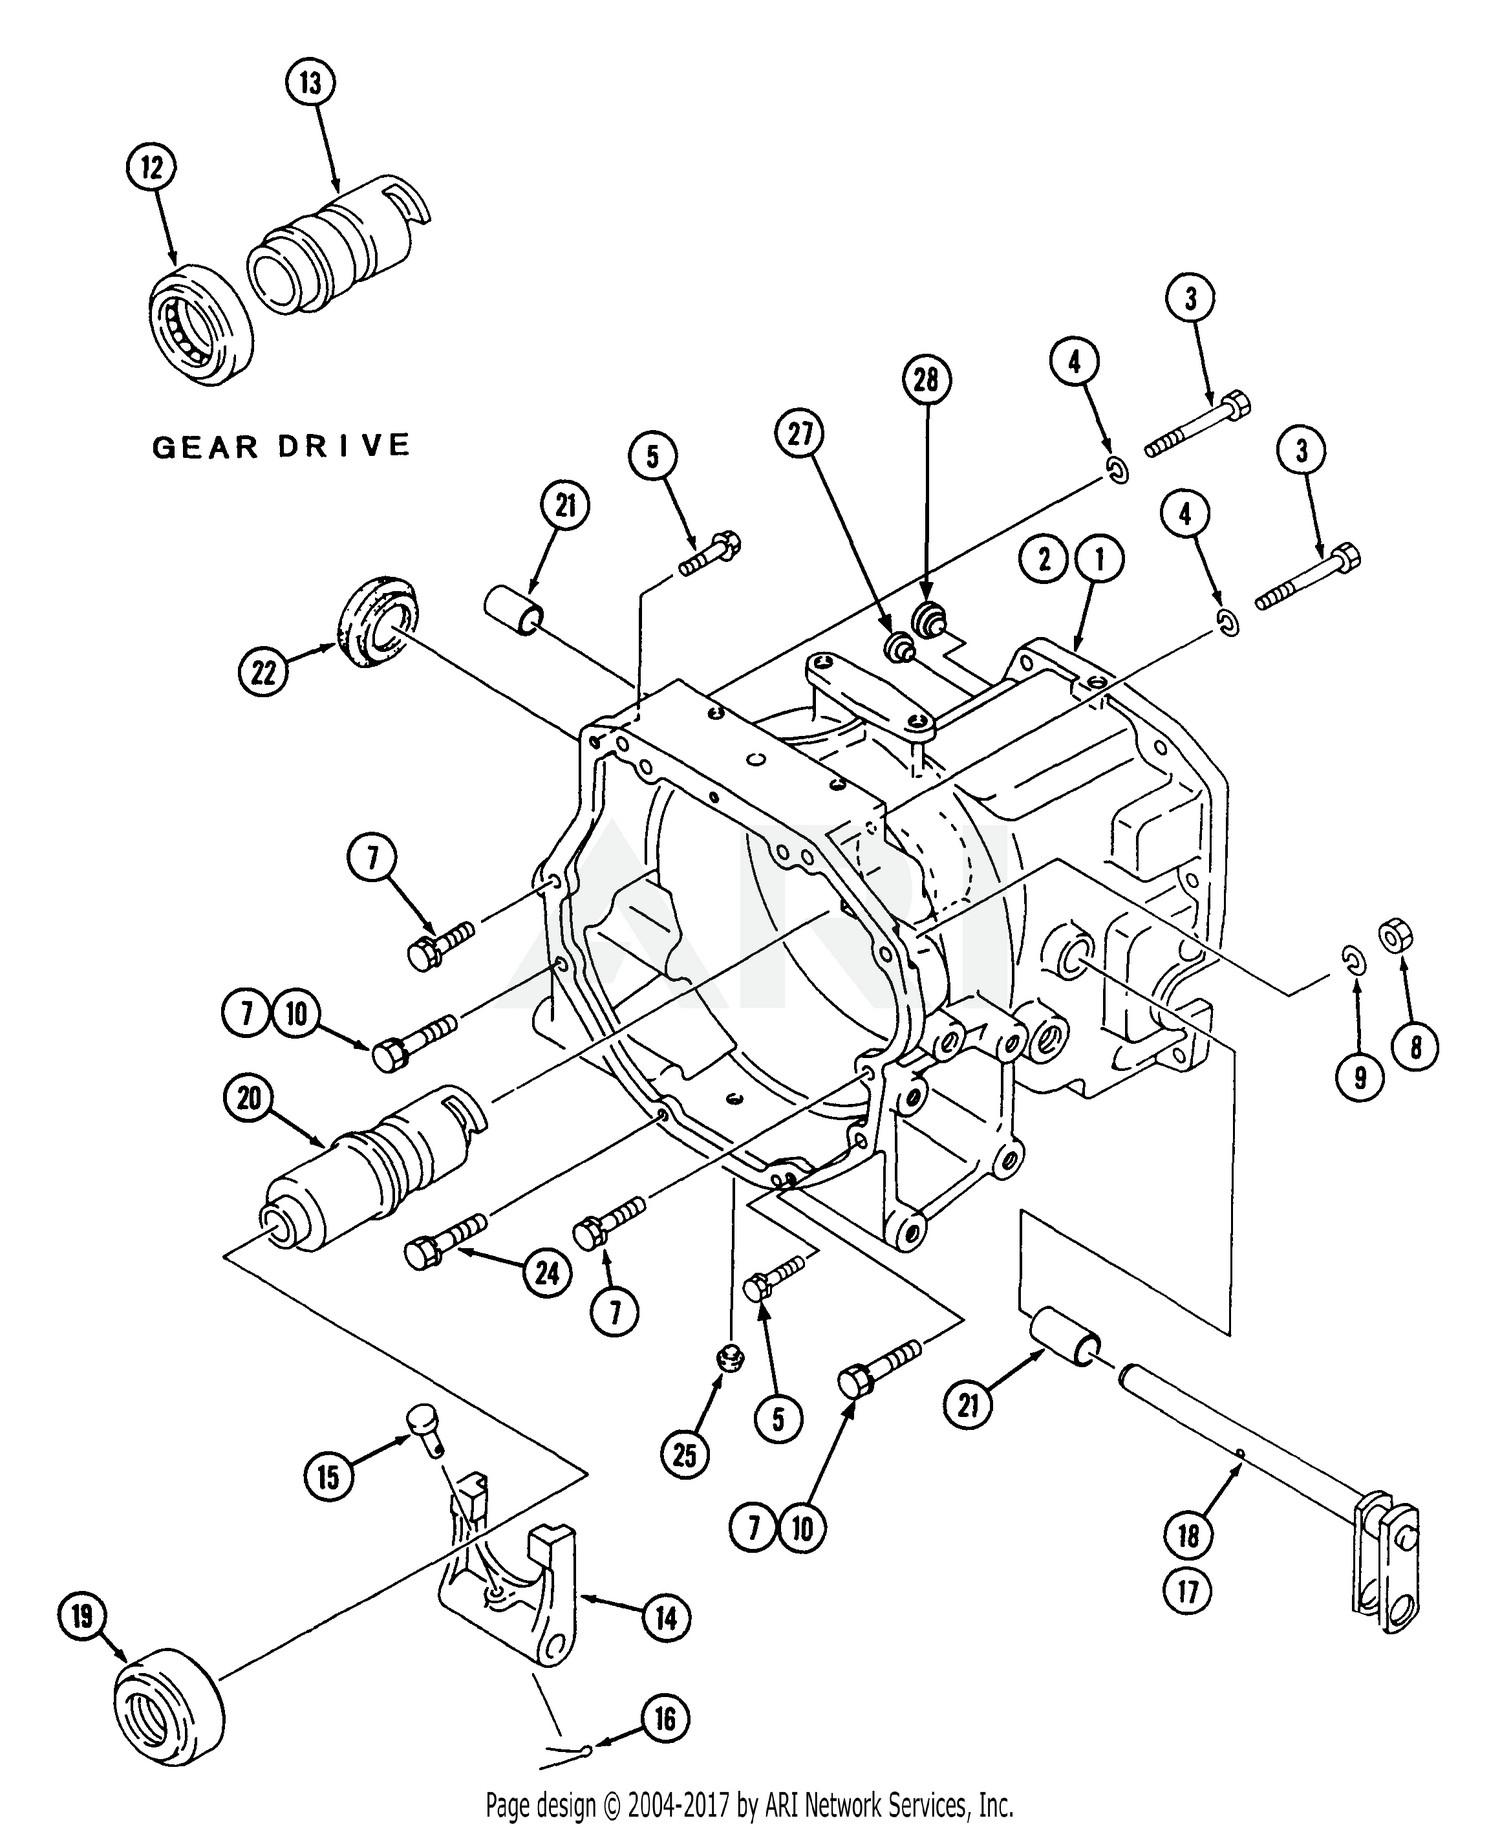 Auto Engine Parts Diagram Cub Cadet Parts Diagrams Cub Cadet 7194 Tractor 544 432d100 546 Of Auto Engine Parts Diagram